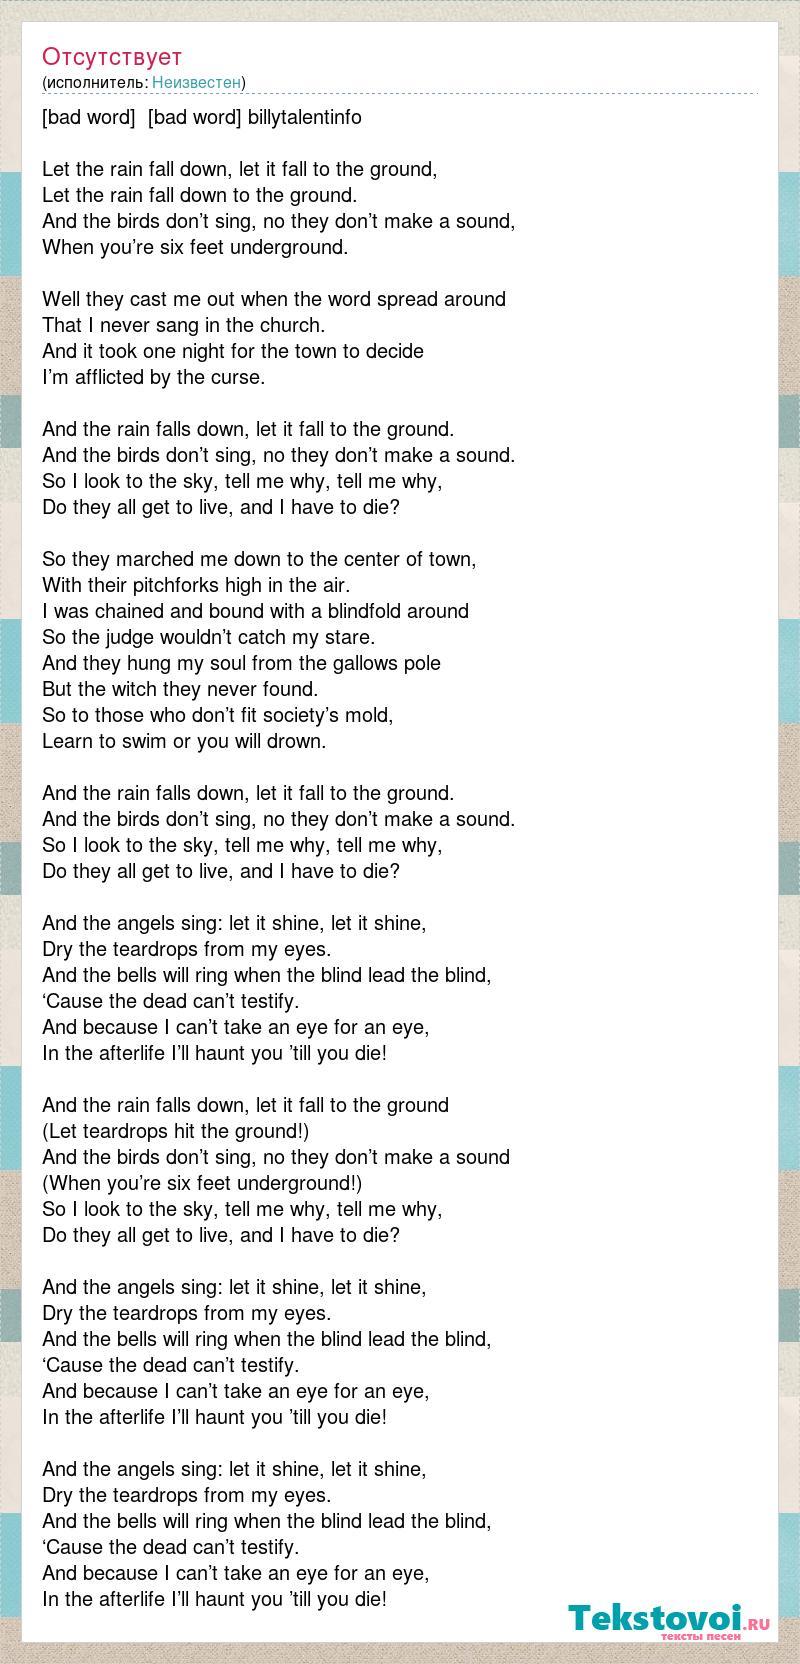 When The Angels Sing Lyrics